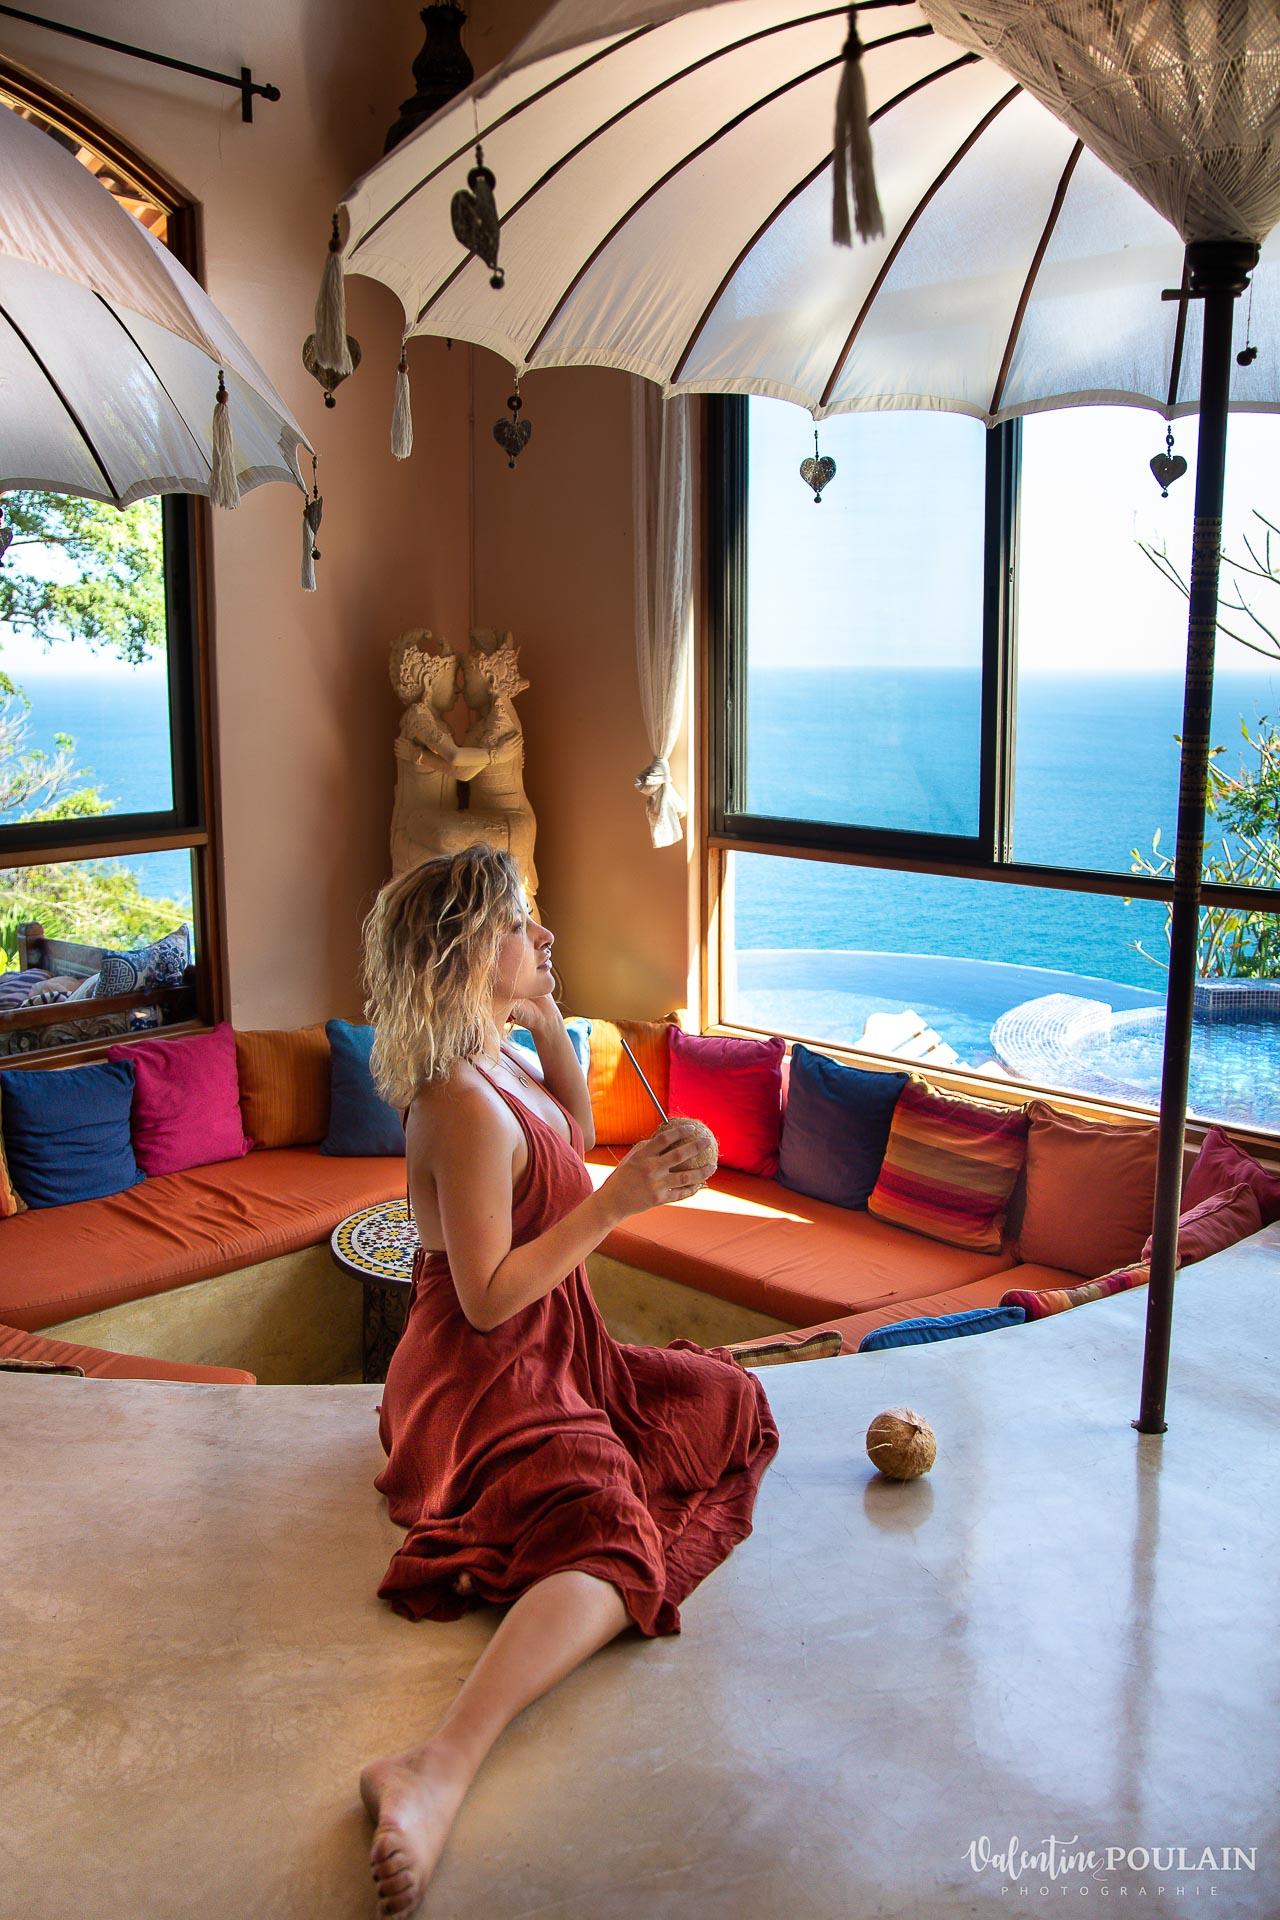 Photo Hotel Costa Rica ANAMAYA_ Valentine Poulain cocktail